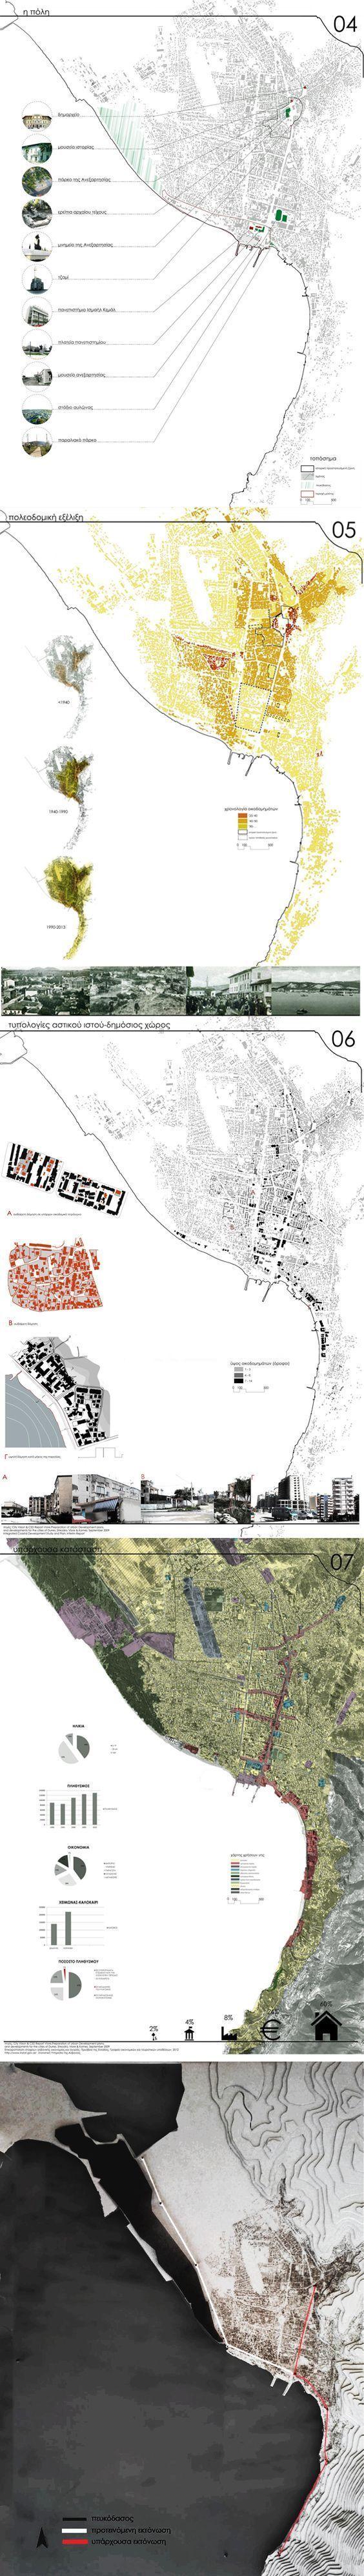 #articlesArticles - ΔΙΠΛΩΜΑΤΙΚΕΣ - ΕΡΓΑΣΙΕΣ - Συμμετοχες 2014 - 167.14 ΠΡΟΣ|ΣΤΗ ΘΑΛΑΣΣΑ: #urbaneanalyse #articlesArticles - ΔΙΠΛΩΜΑΤΙΚΕΣ - ΕΡΓΑΣΙΕΣ - Συμμετοχες 2014 - 167.14 ΠΡΟΣ|ΣΤΗ ΘΑΛΑΣΣΑ: #urbaneanalyse